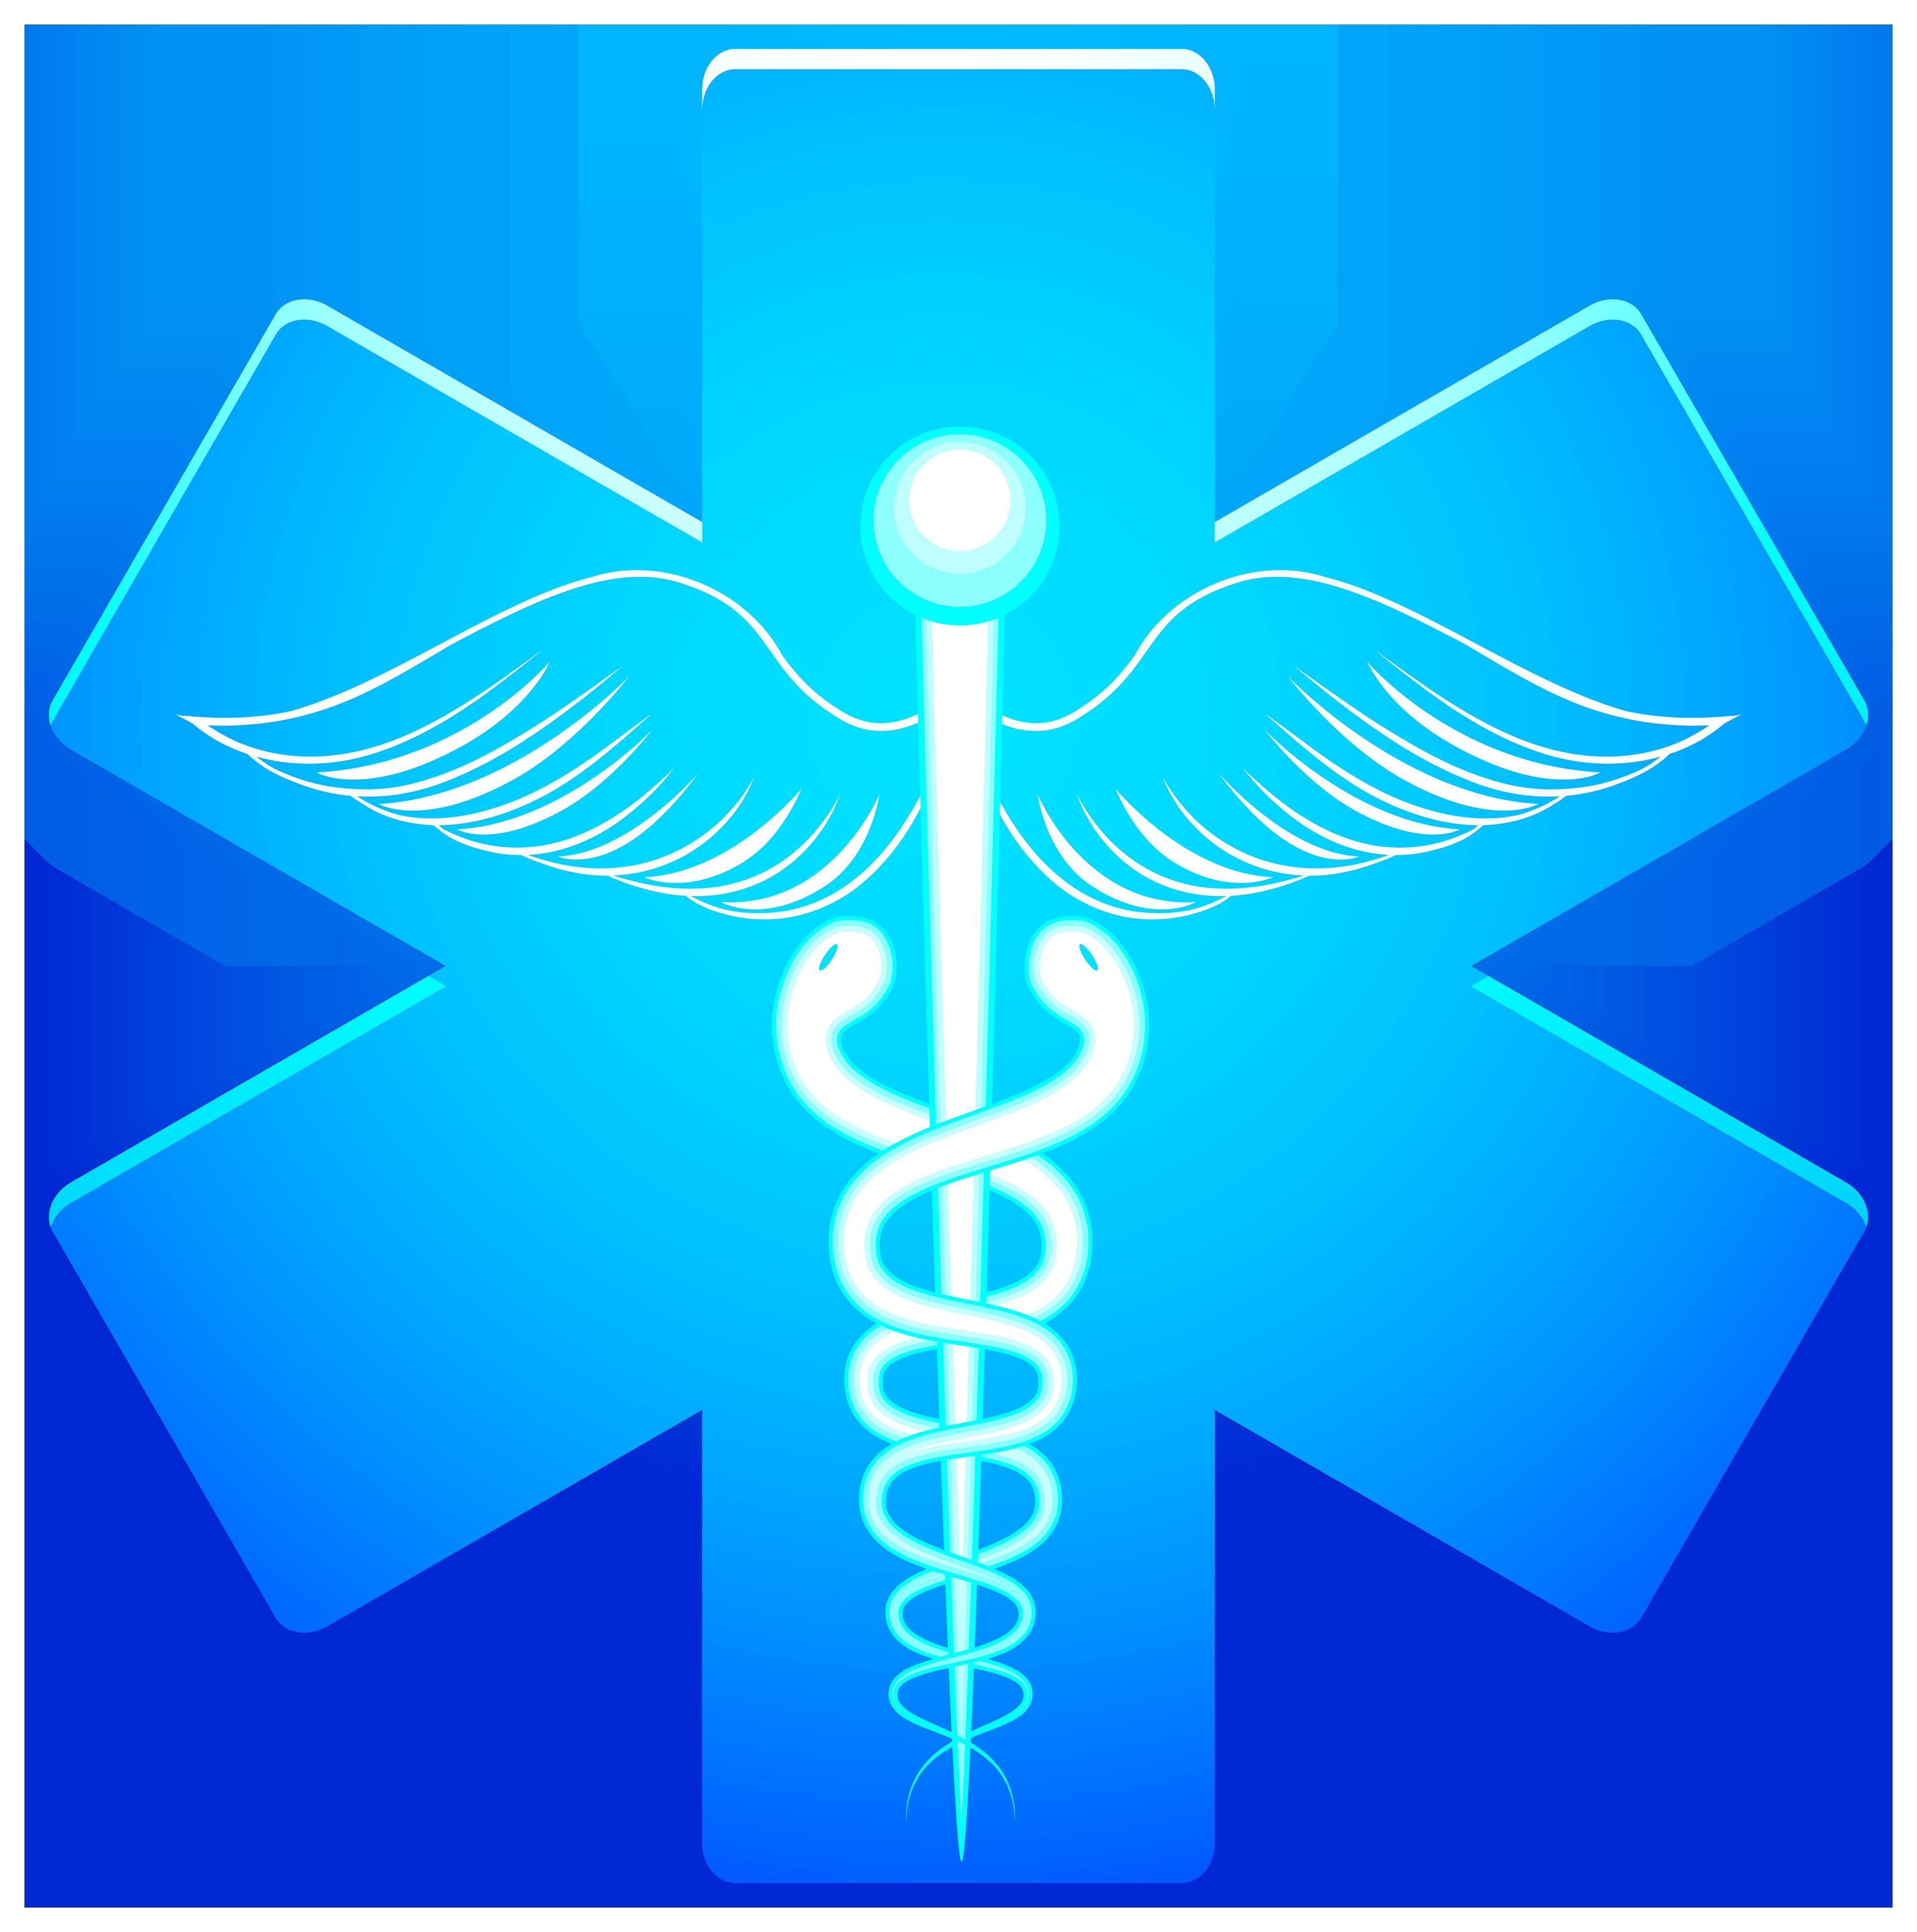 Symbol png best web. Pharmacist clipart